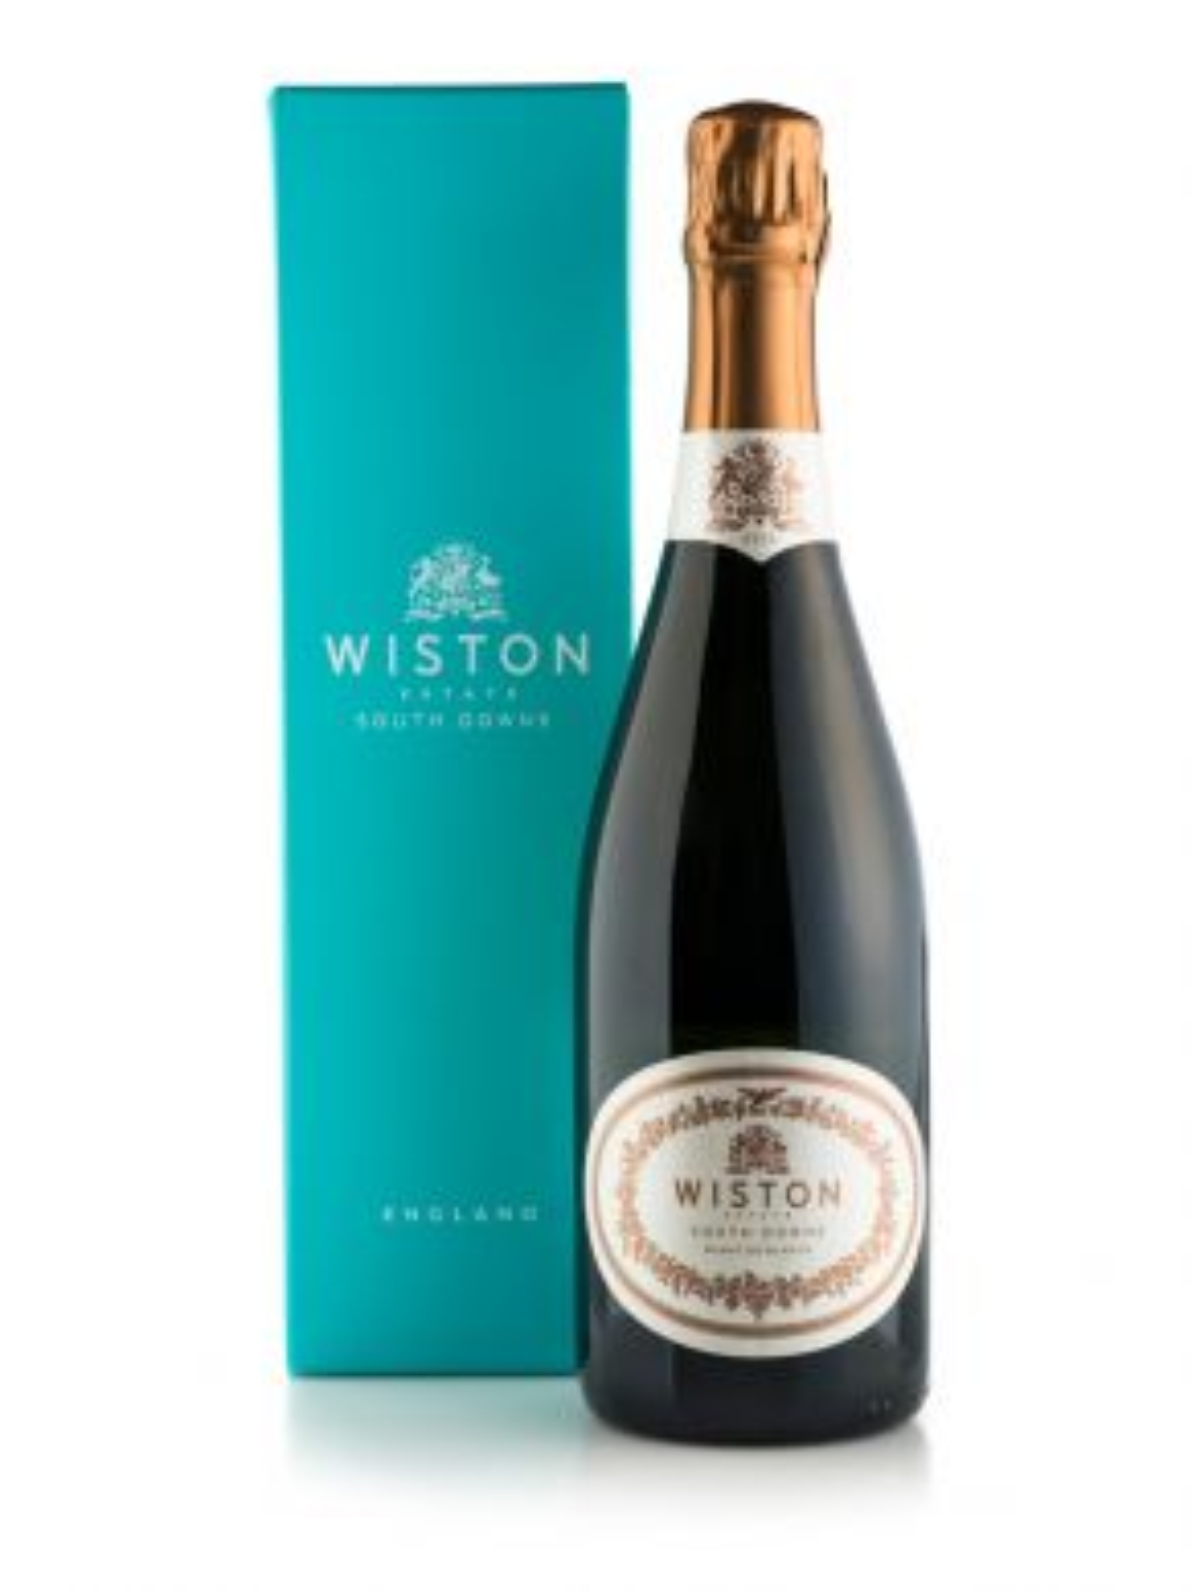 Wiston Estate Blanc de Blancs 2010 Sparkling Wine 75cl